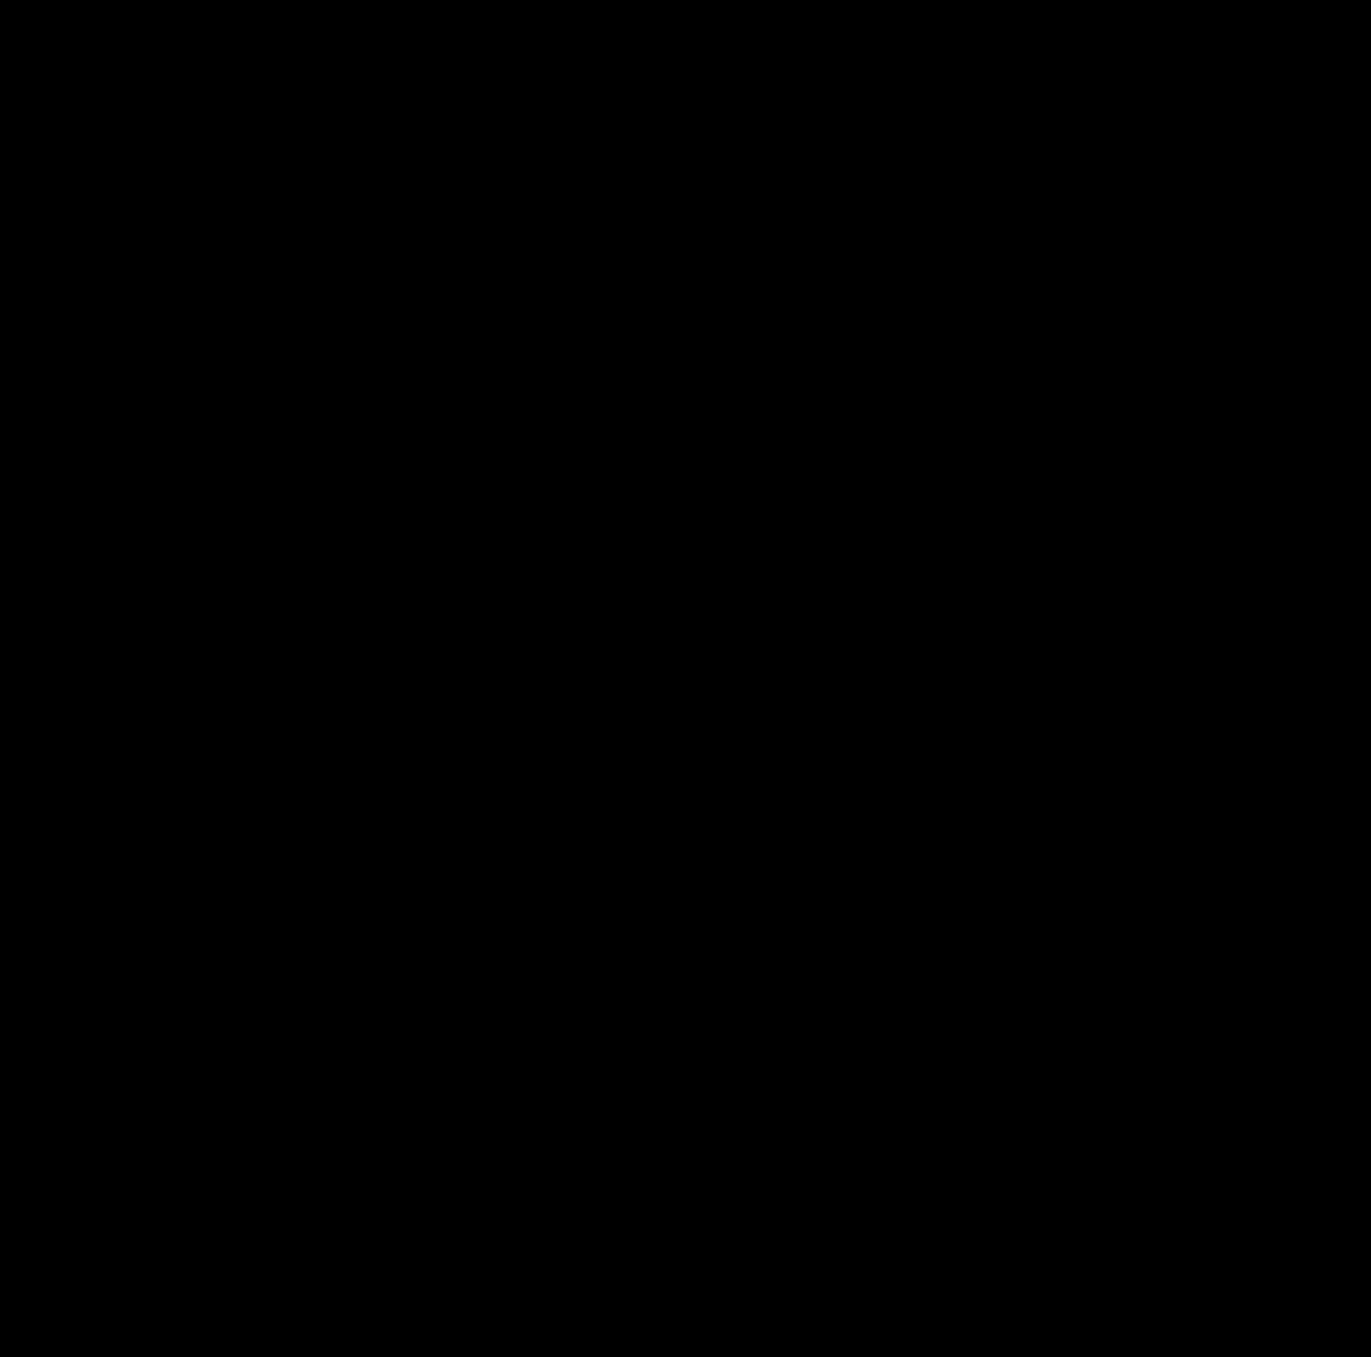 Download God Of War Omega Symbol Png Clipart Black And White ...